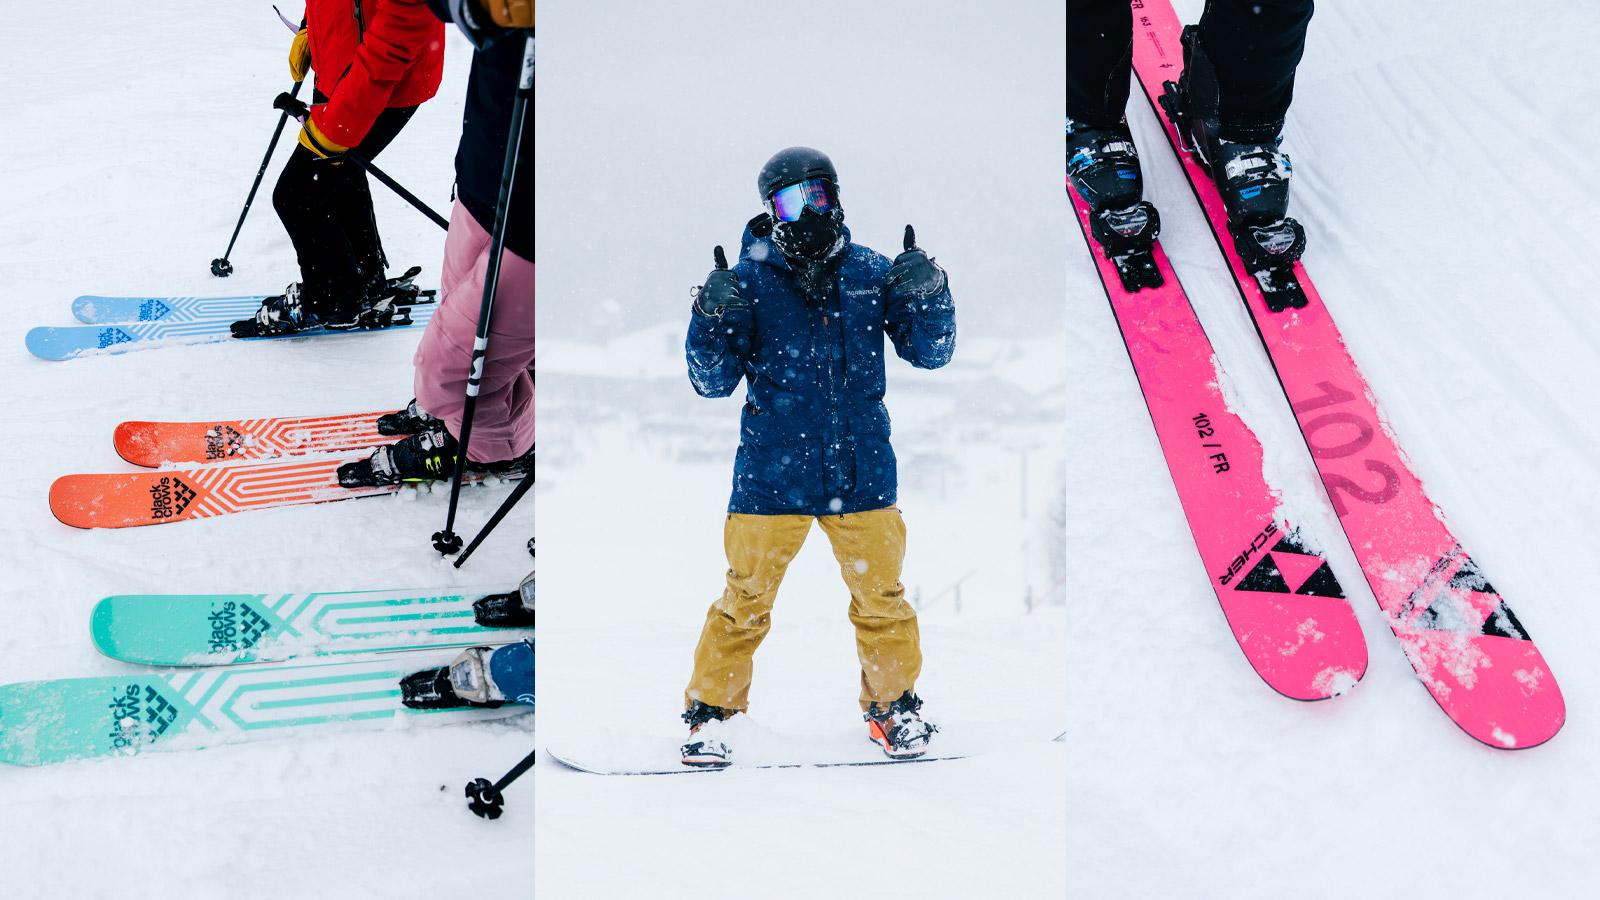 the ski monster, black crows skis, fischer skis, ski testing